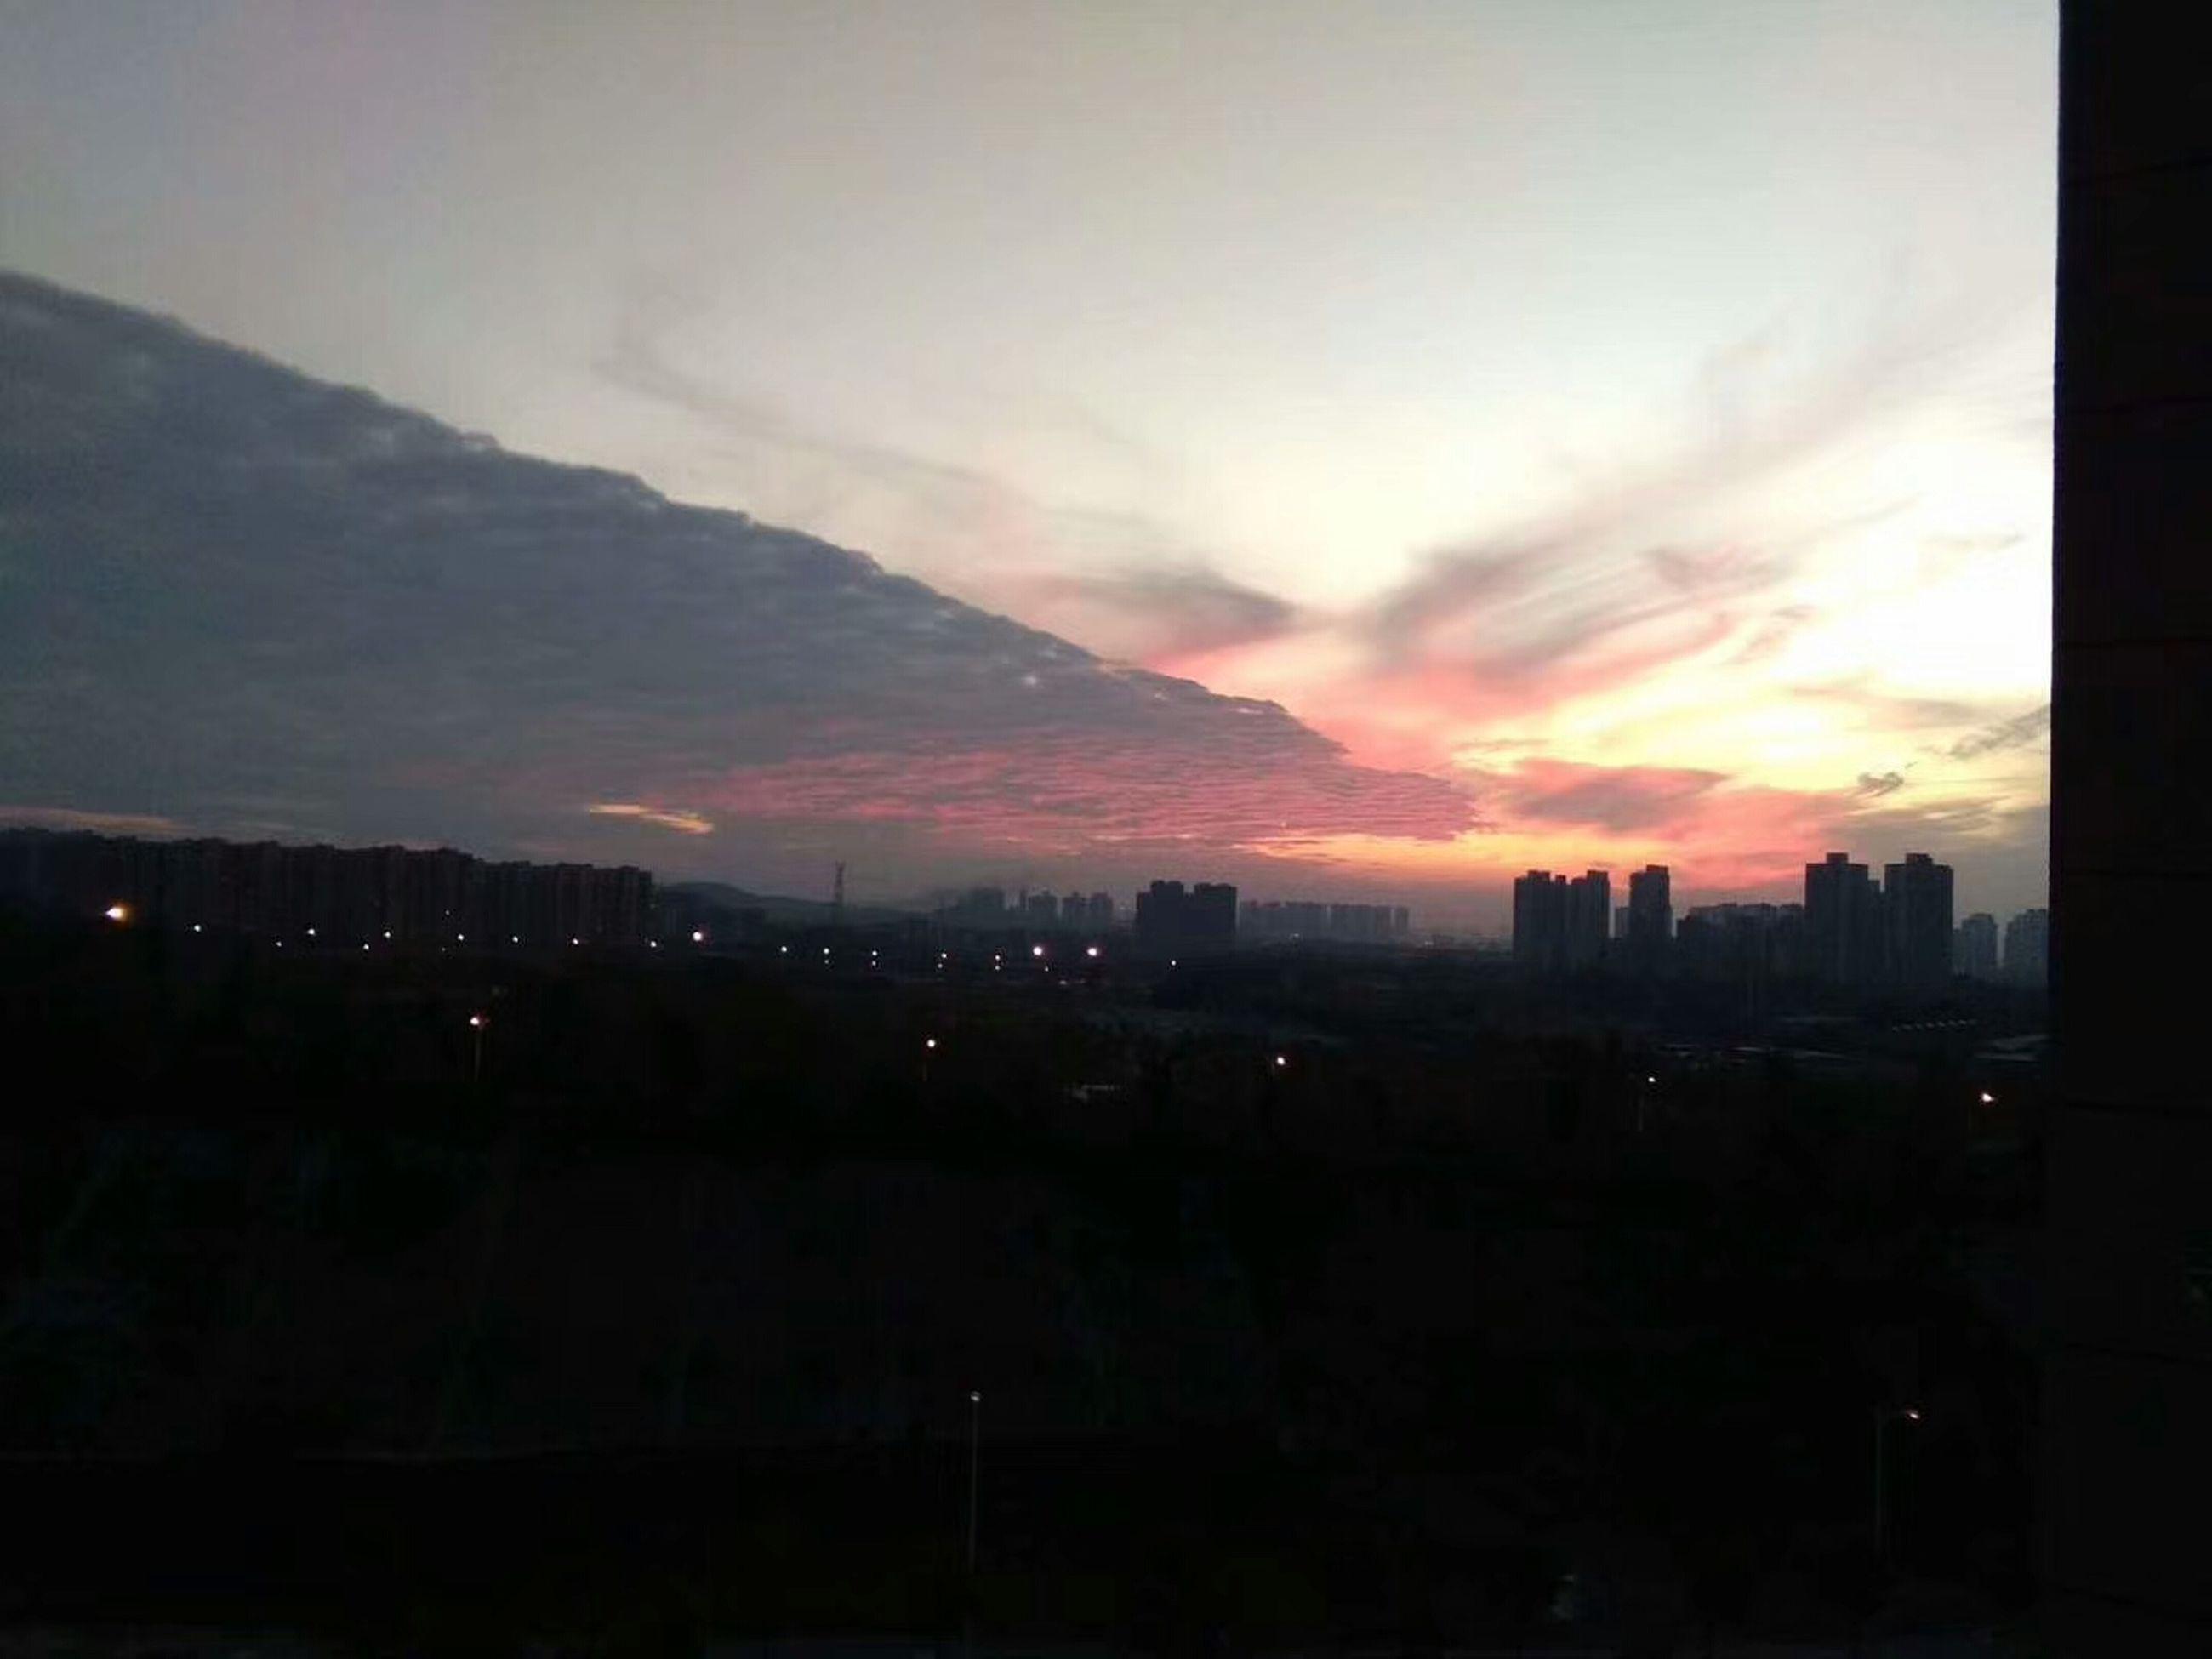 sunset, sky, architecture, cityscape, building | EyeEm